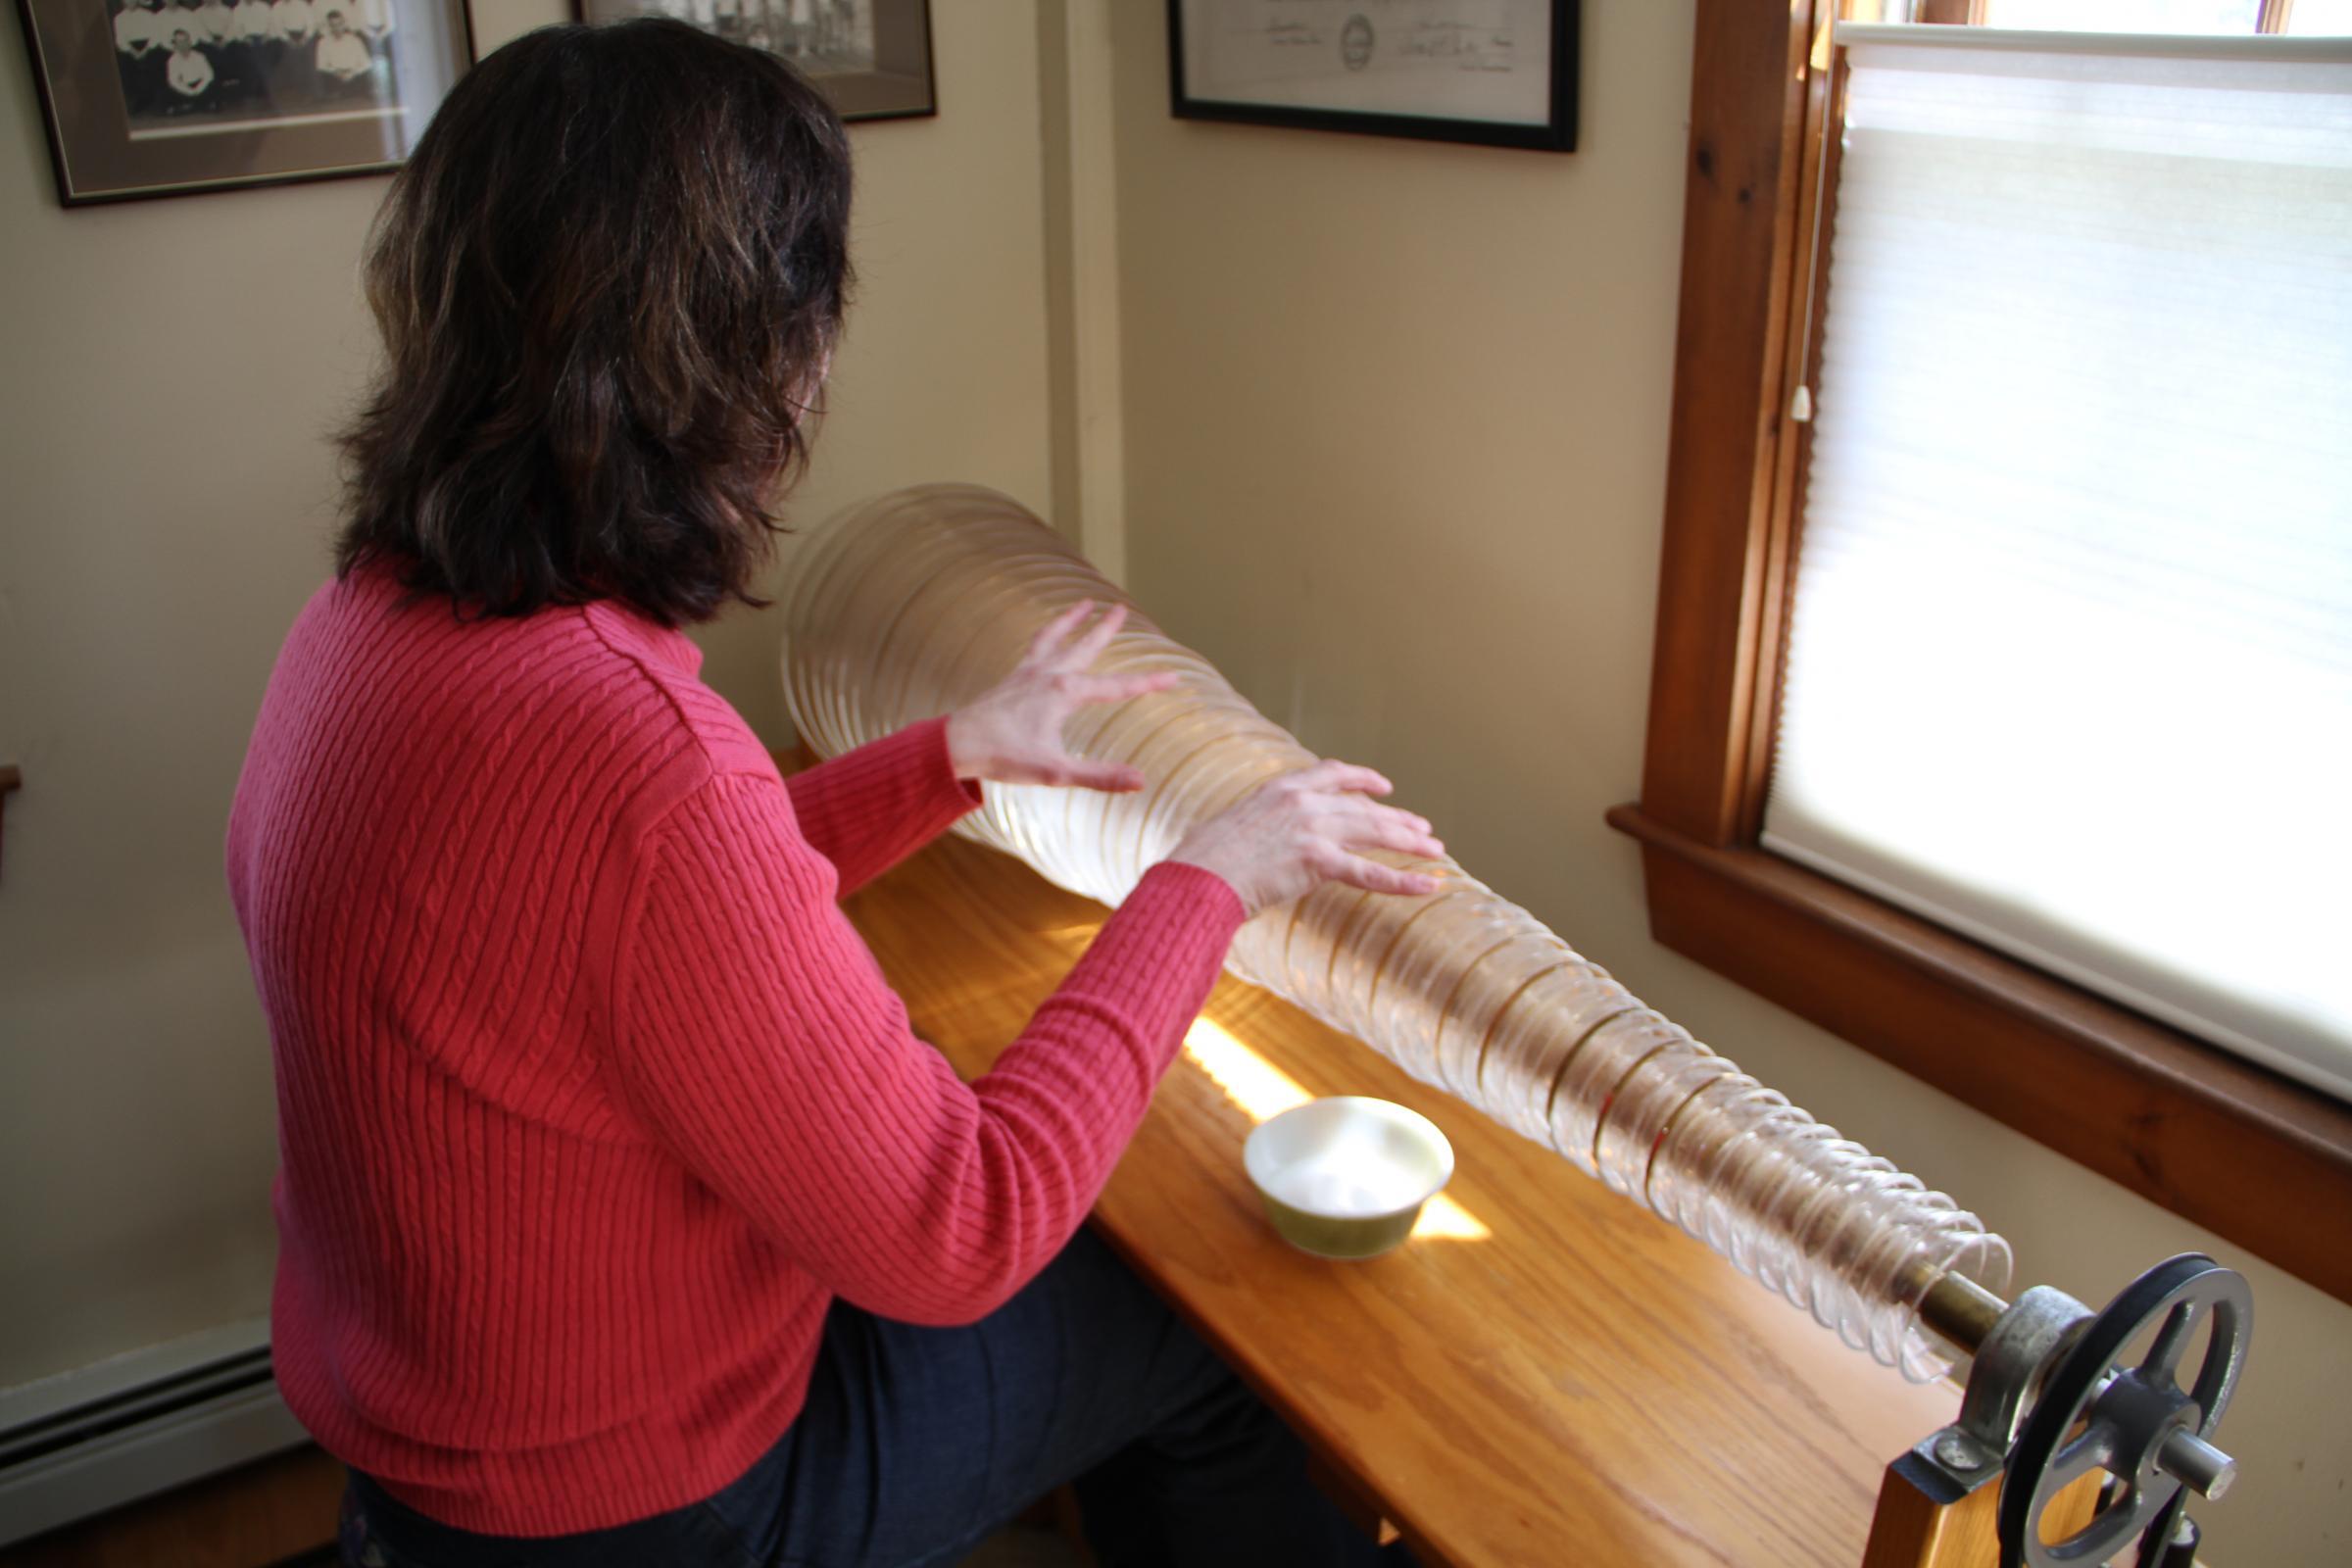 Caption: Carolinn Skyler player the largest Armonica in the world